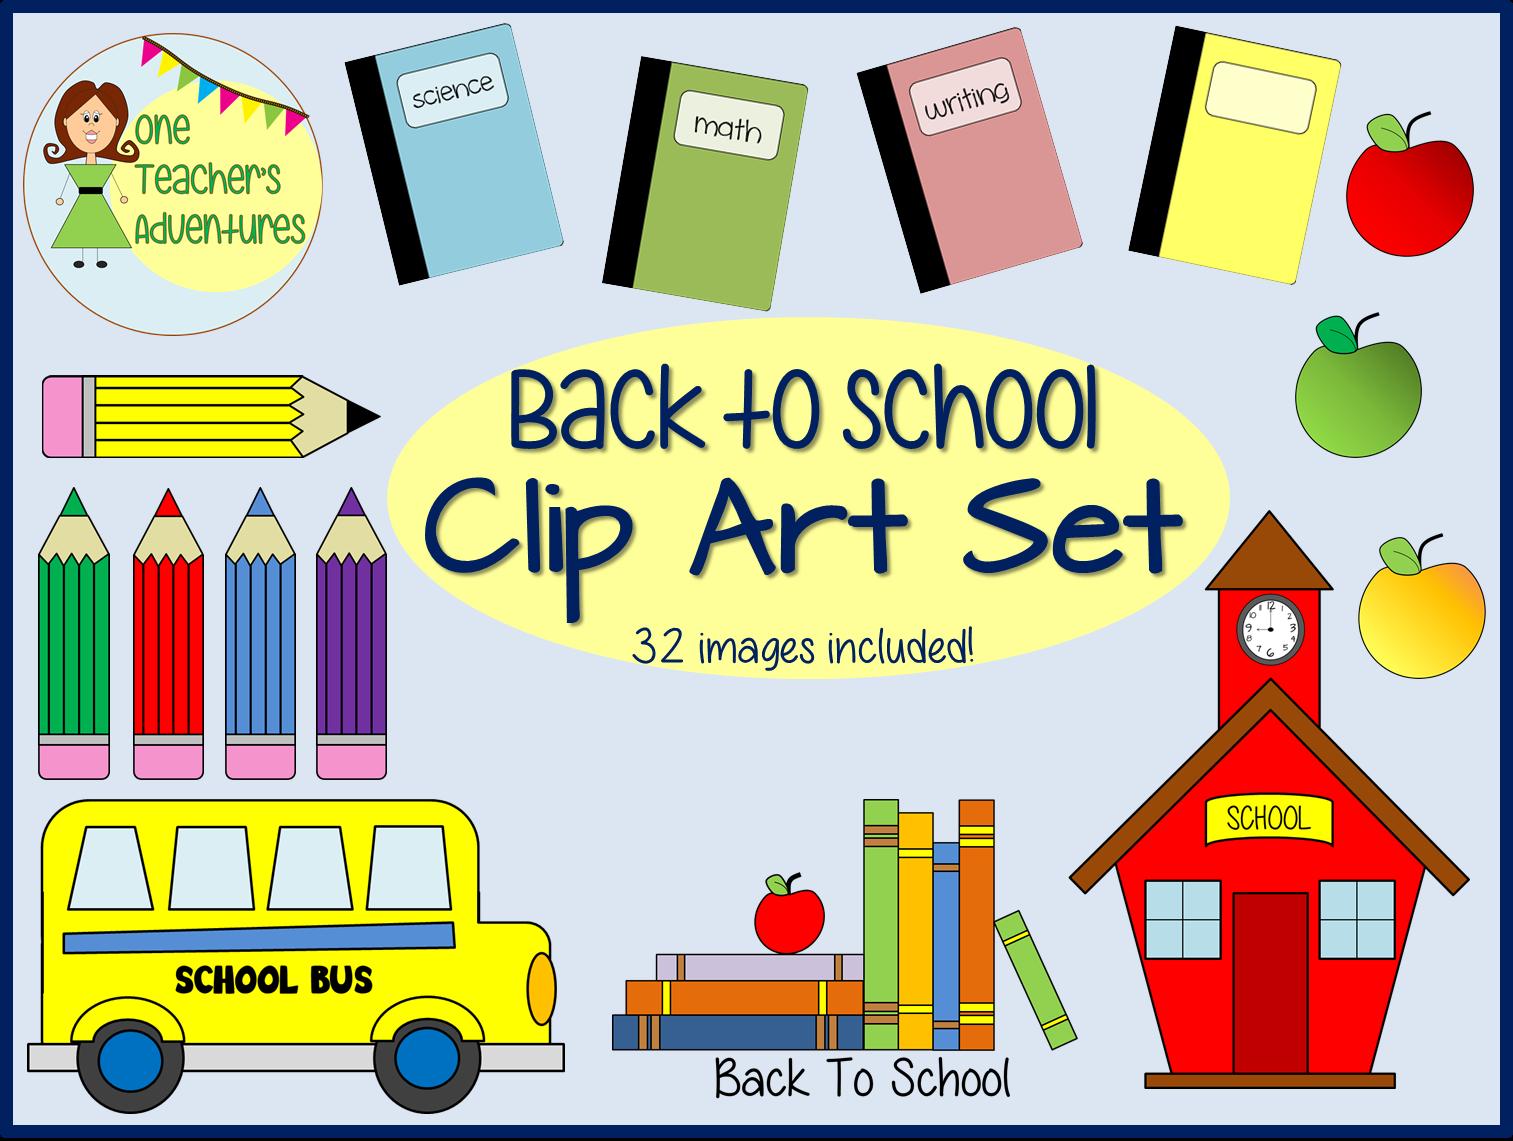 http://www.teacherspayteachers.com/Product/Back-to-School-Clip-Art-1400355